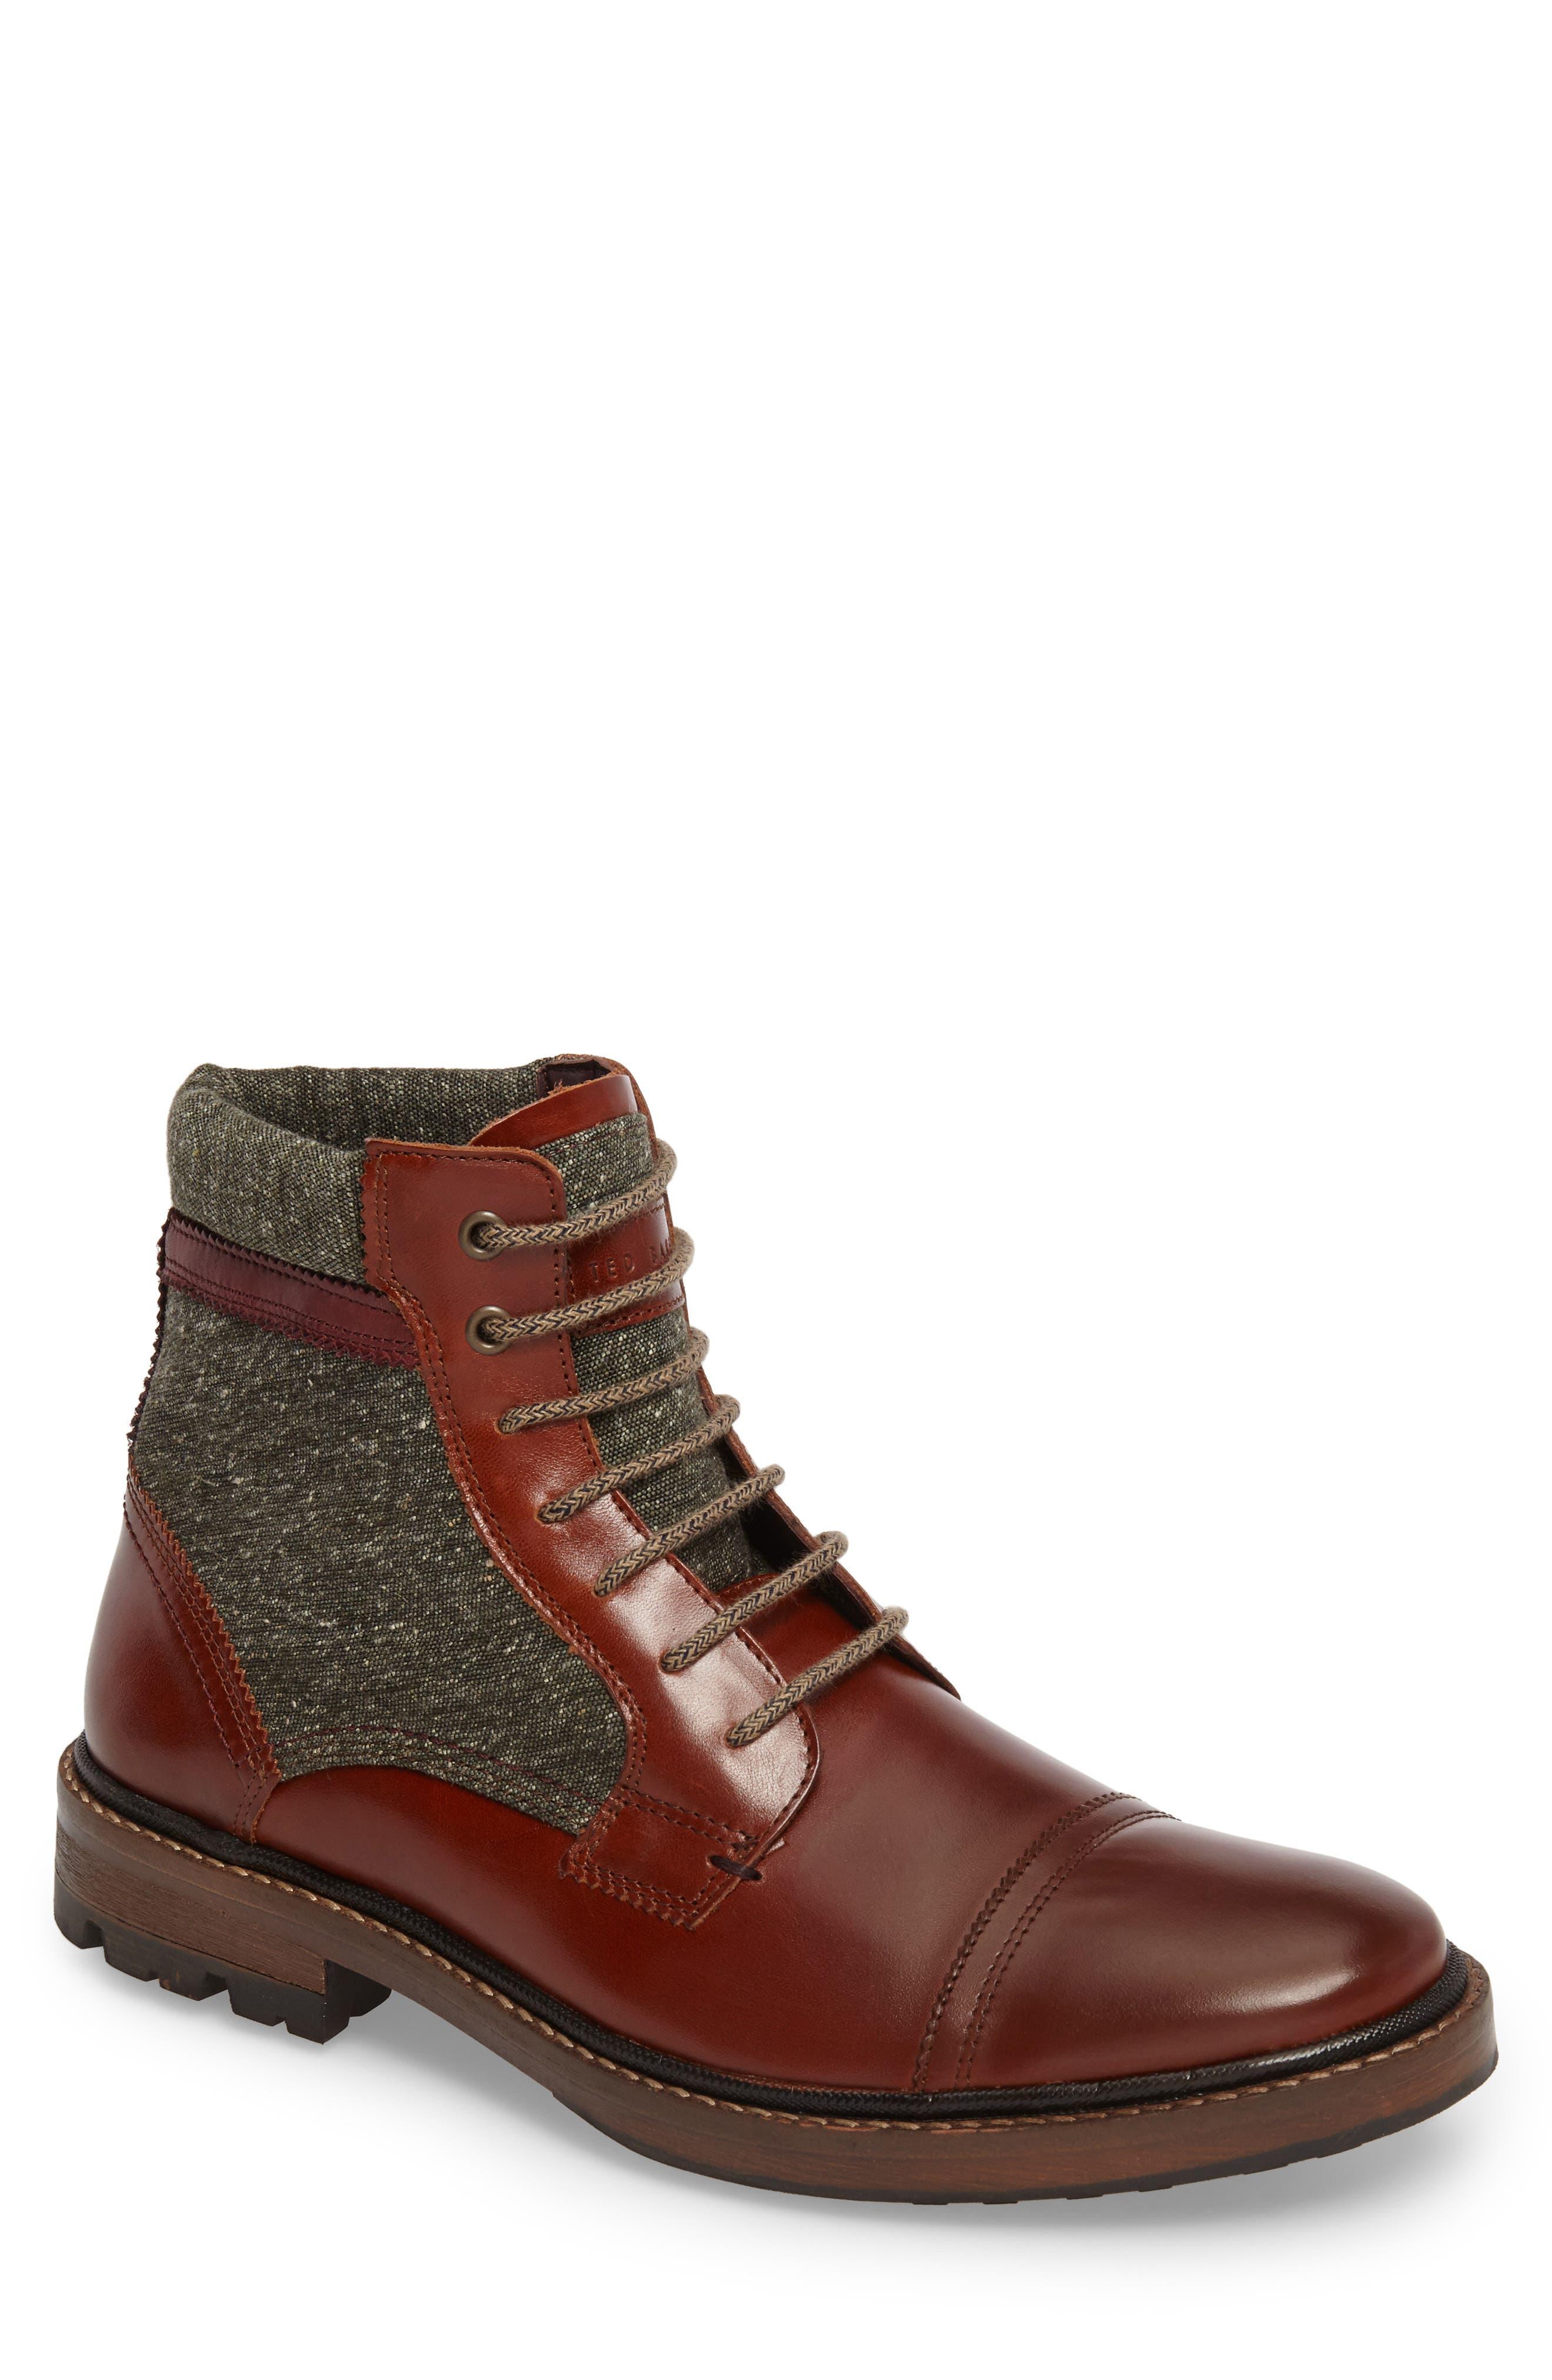 Alternate Image 1 Selected - Ted Baker London Ruulen Cap Toe Boot (Men)